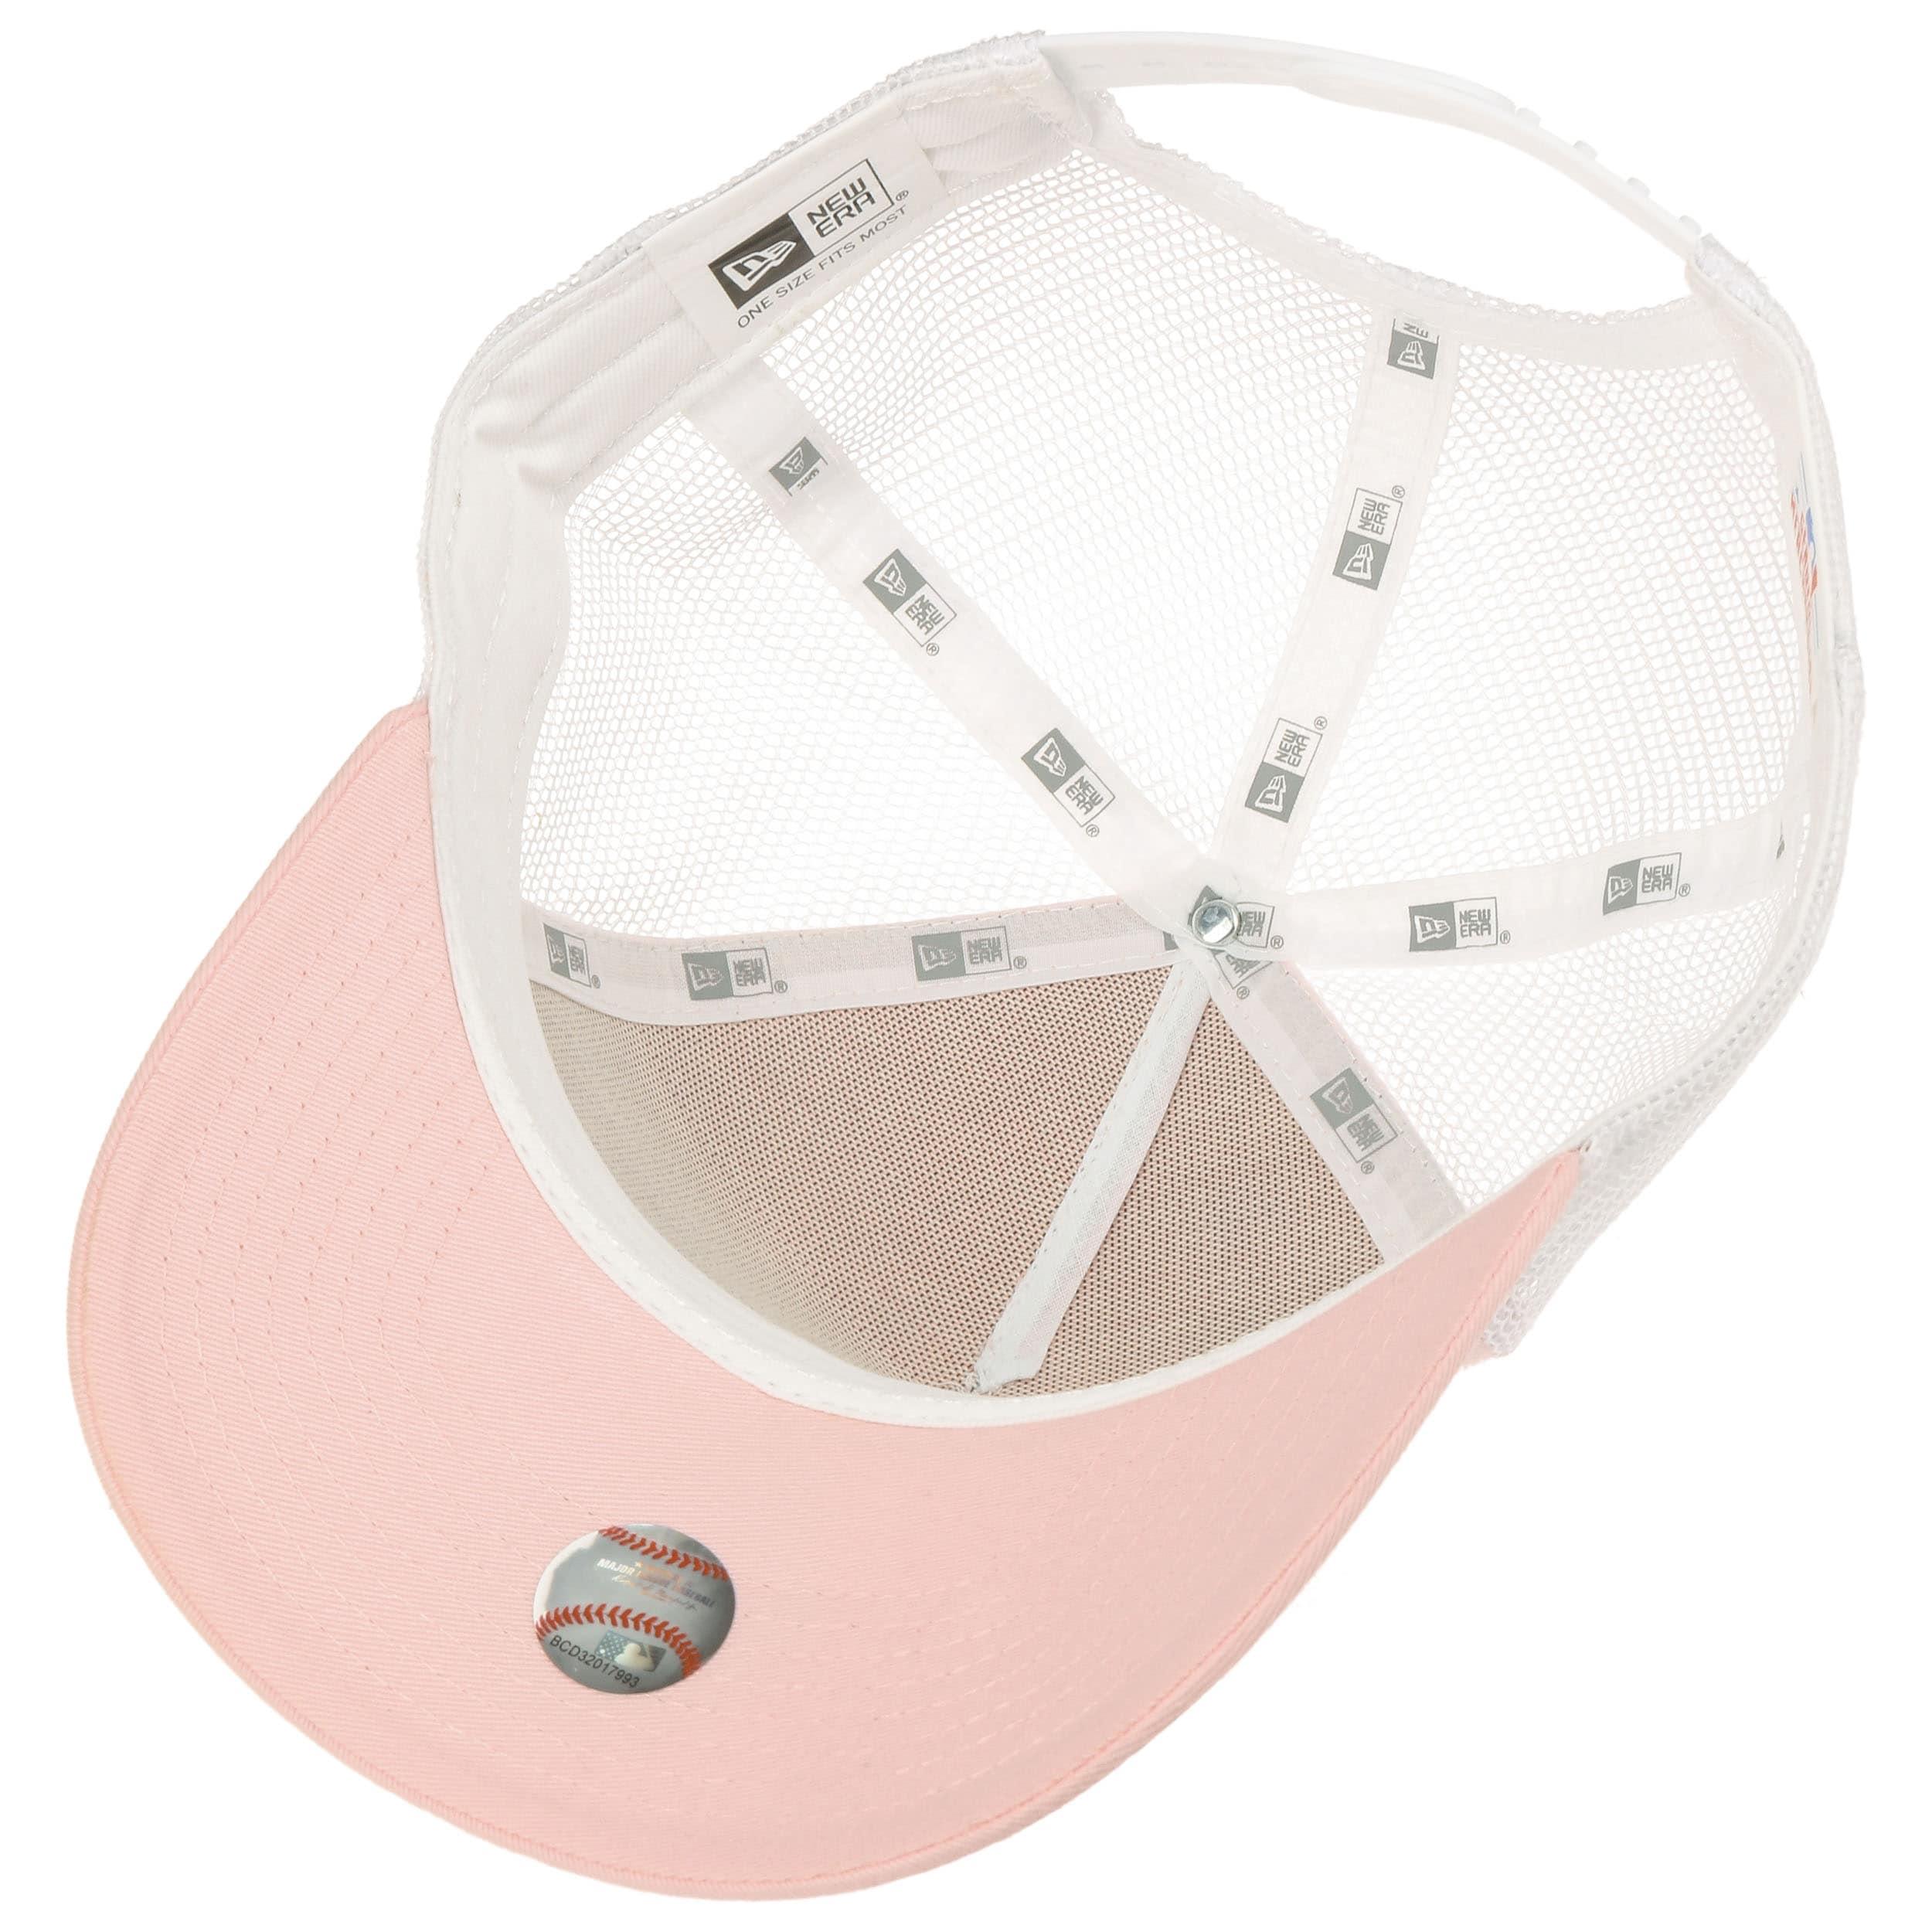 43d3bbe47ac62 ... NY Yankees League Trucker Cap by New Era - pink 2 ...